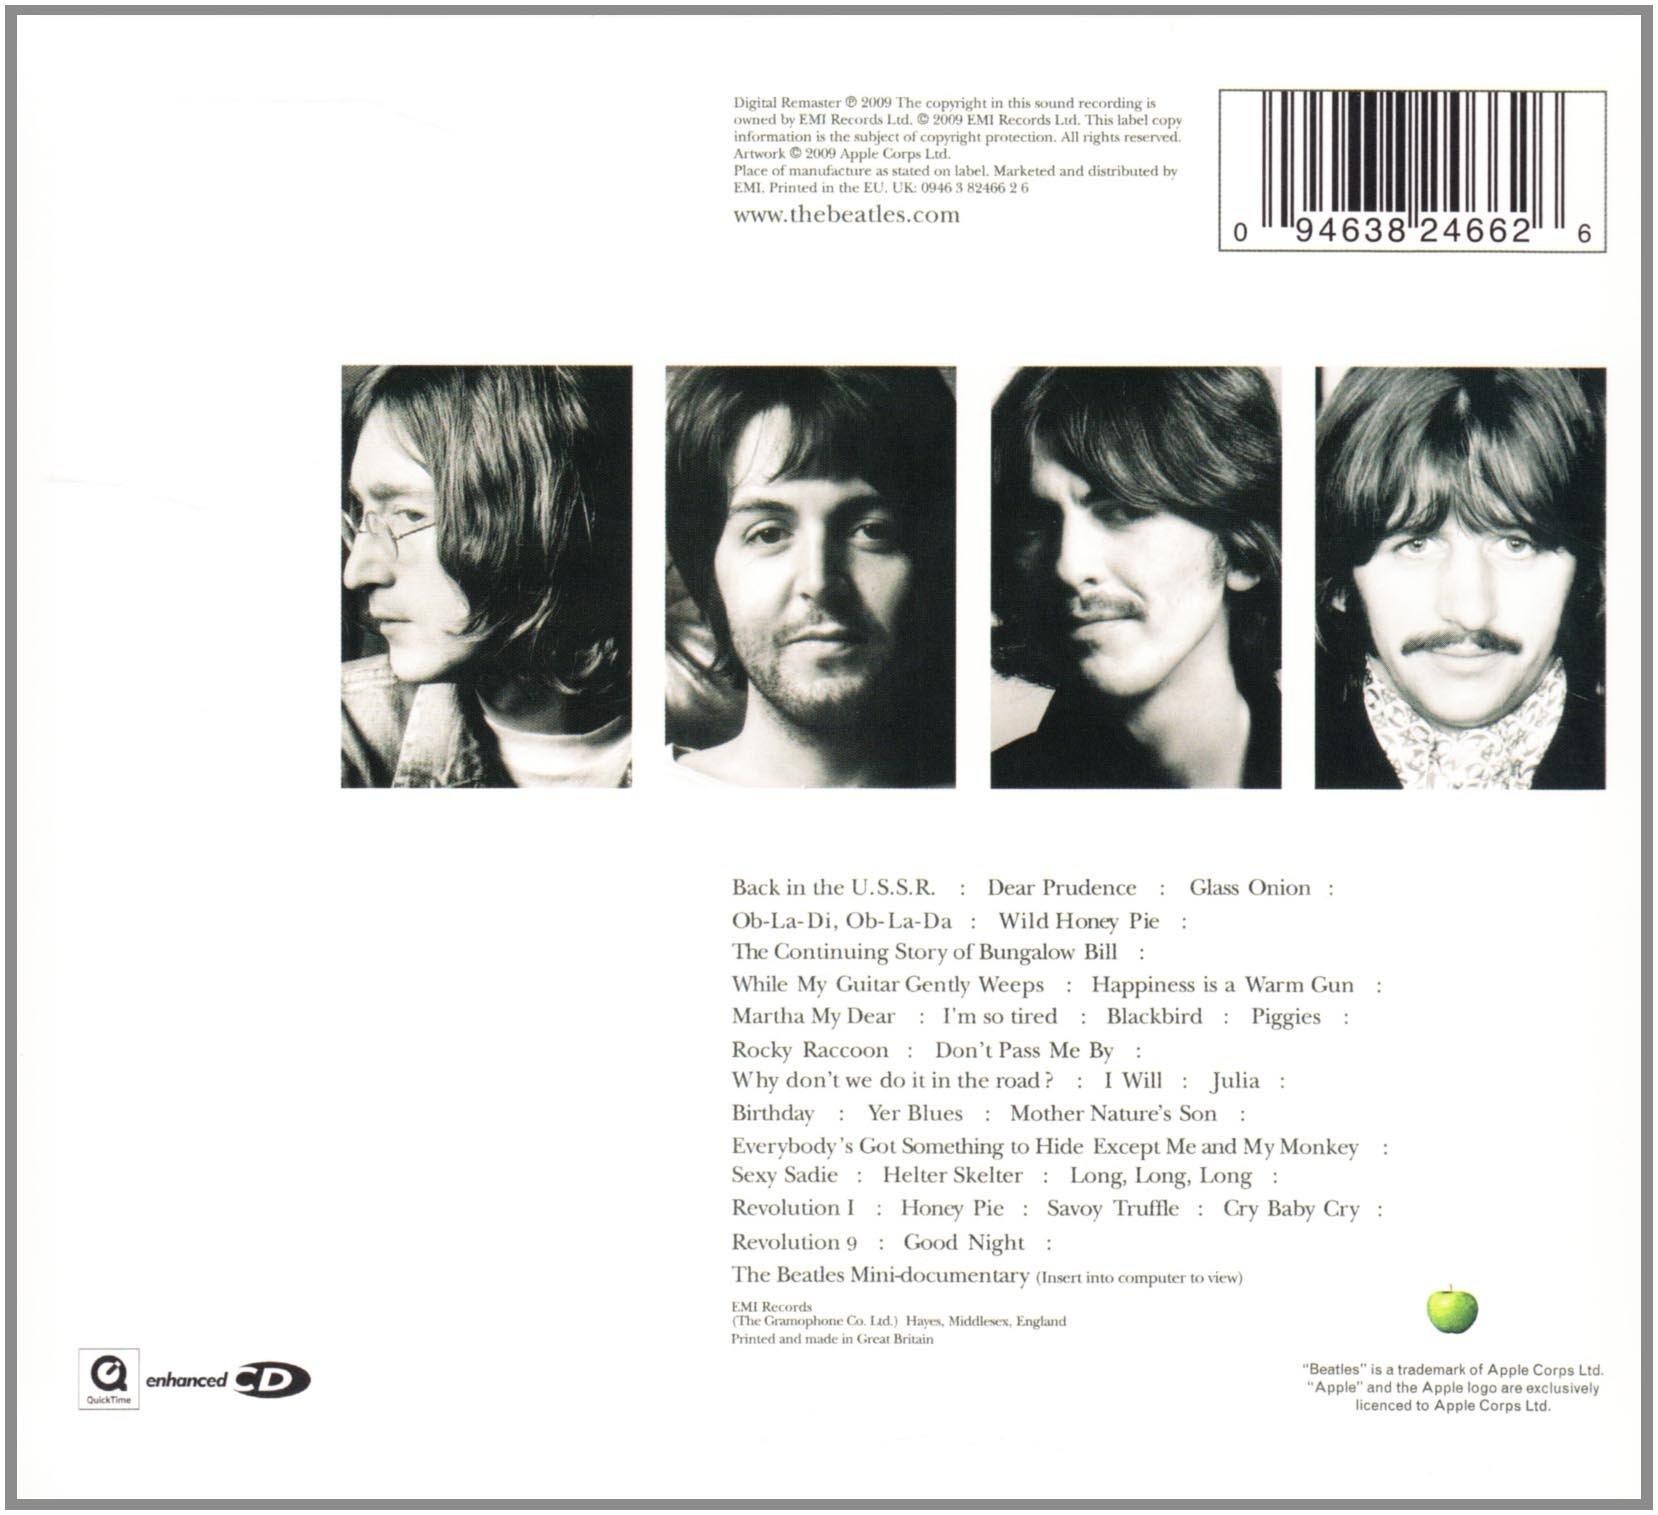 The White Album by EMI Music